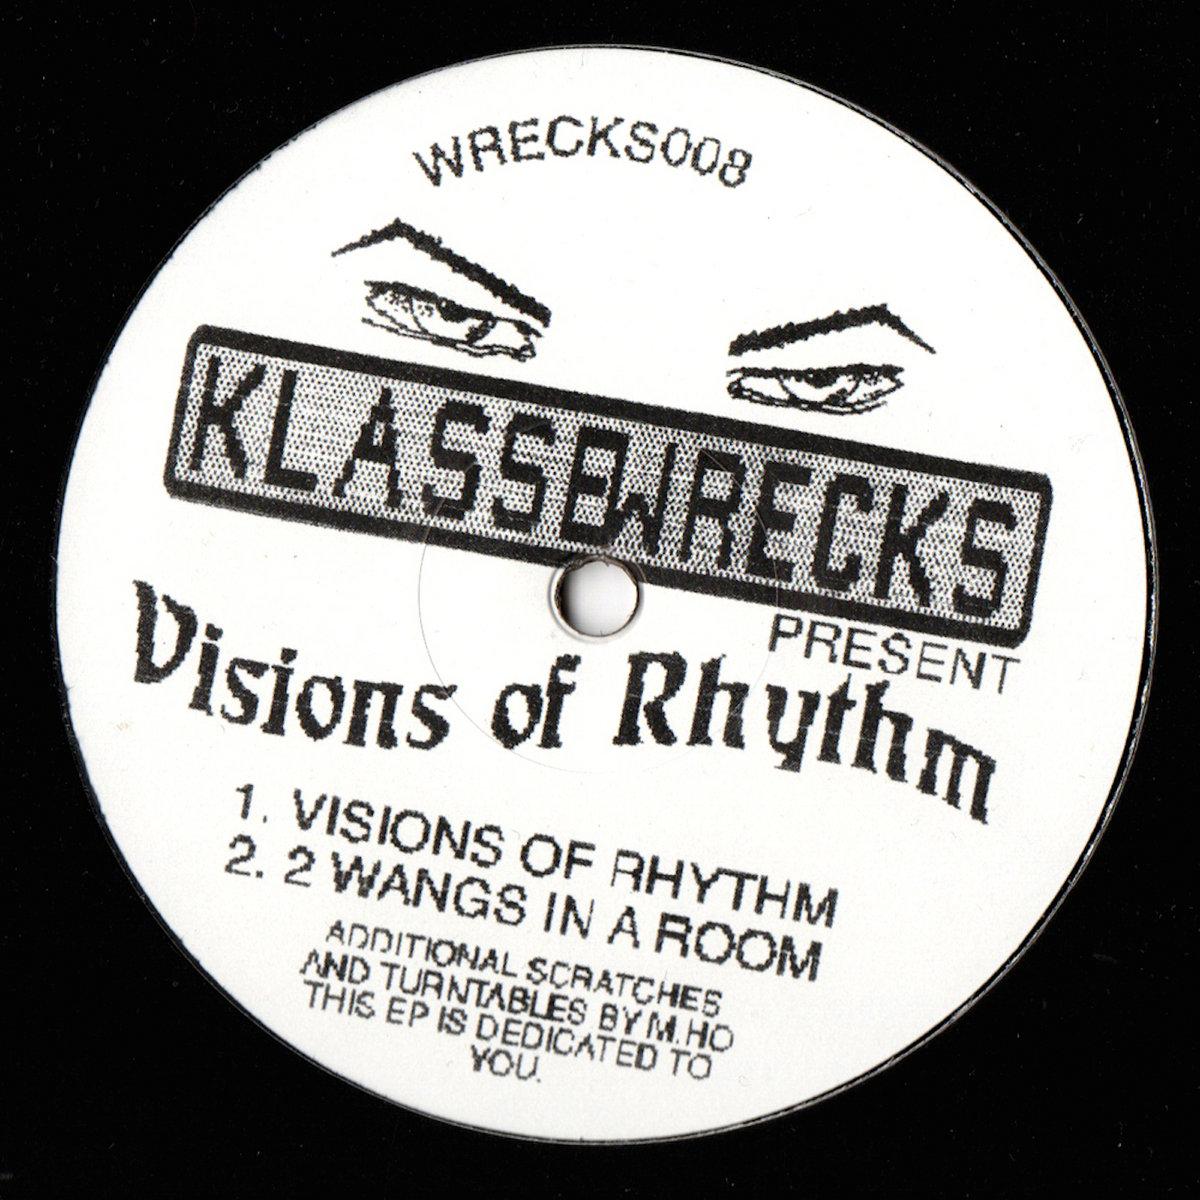 Visions of Rhythm EP | Klasse Wrecks